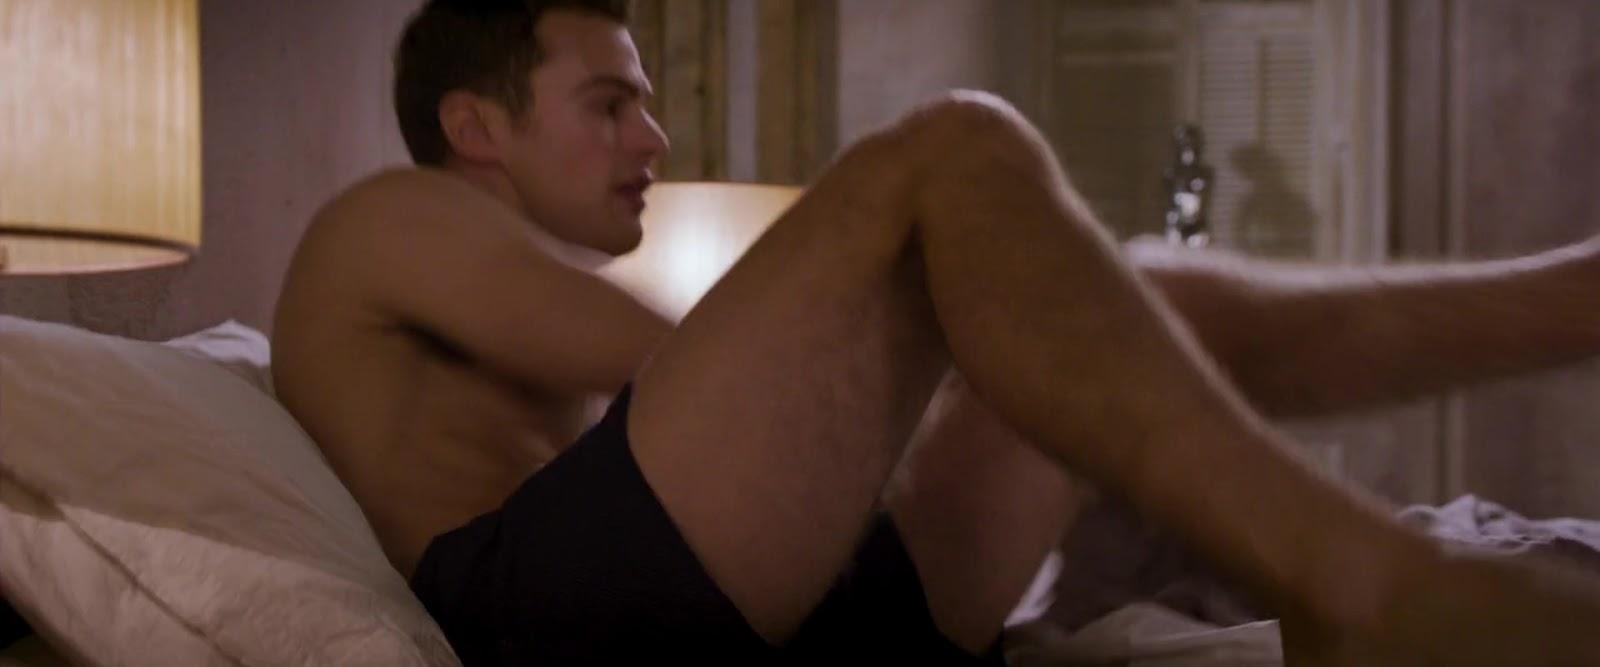 James nude theo Theo James